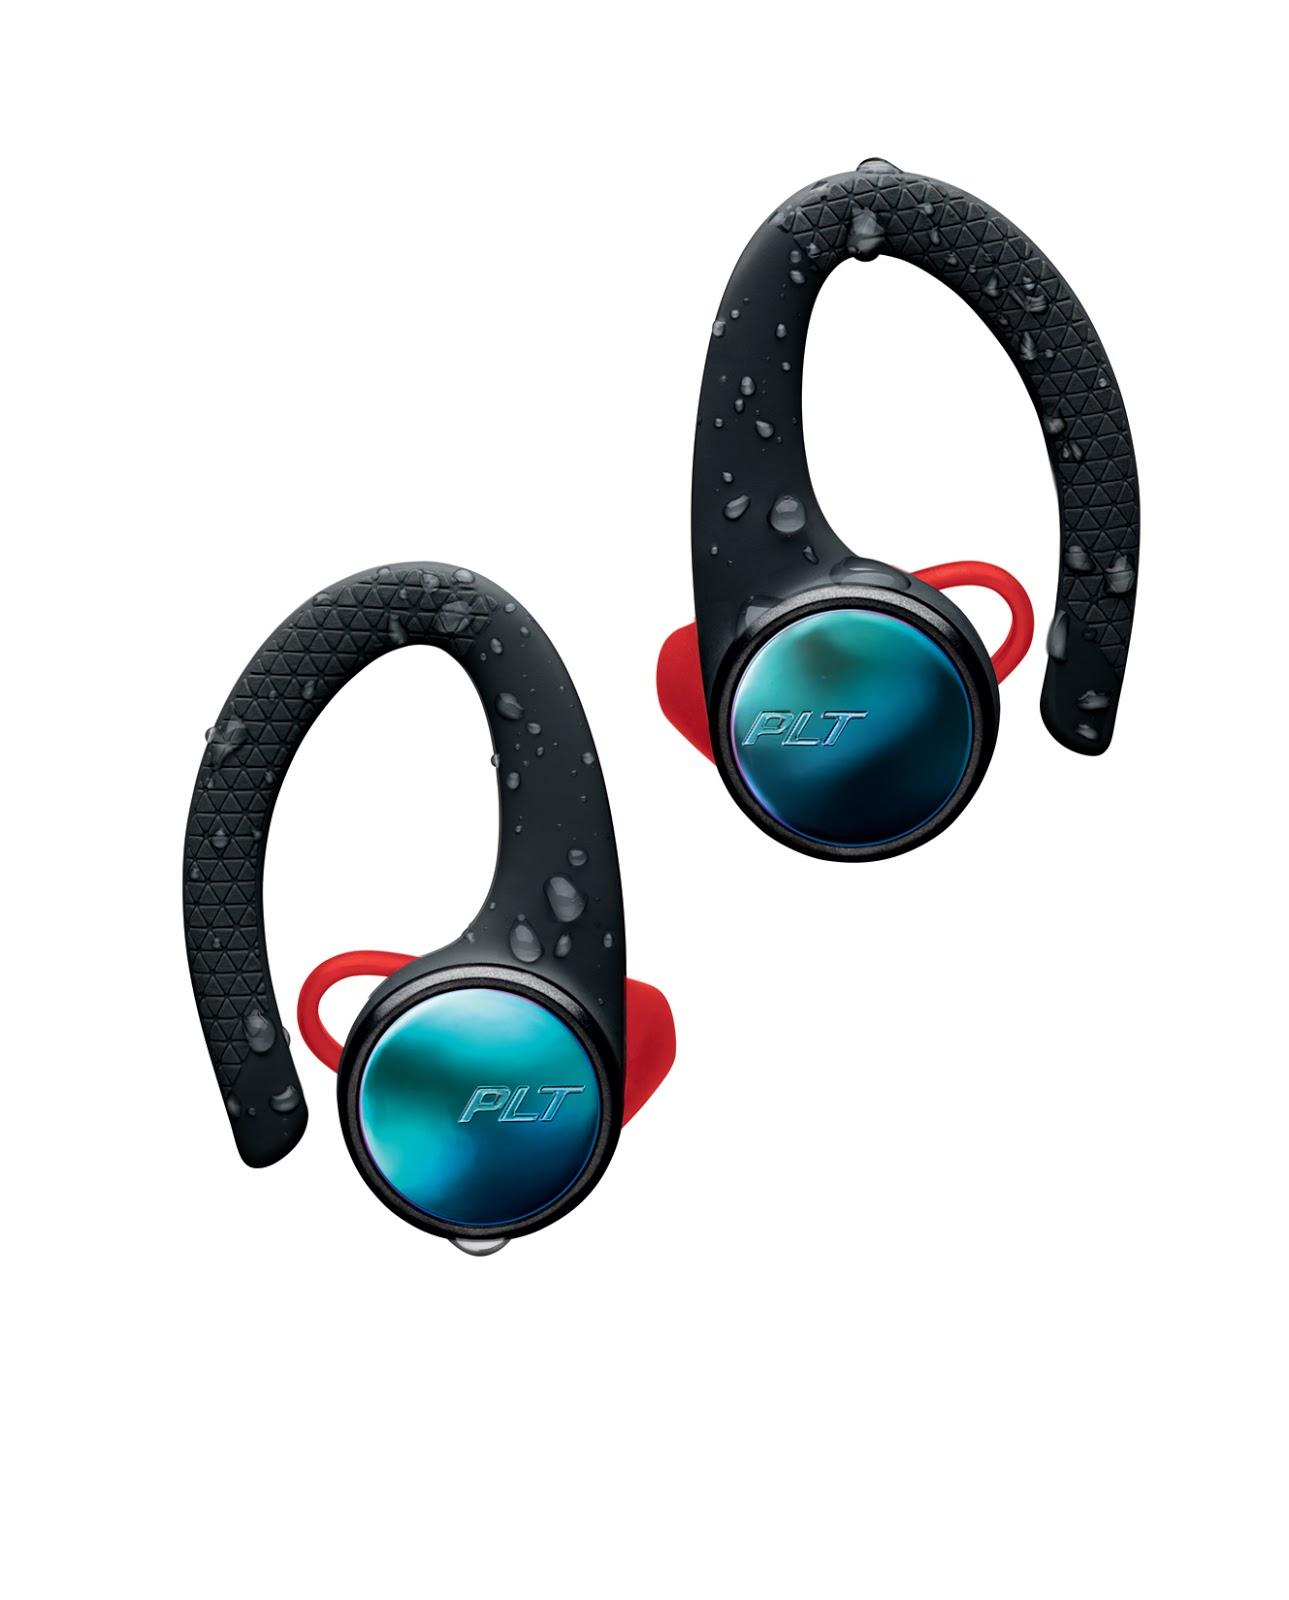 Plantronics BackBeat FIT 3100 Wireless Sports Earbuds